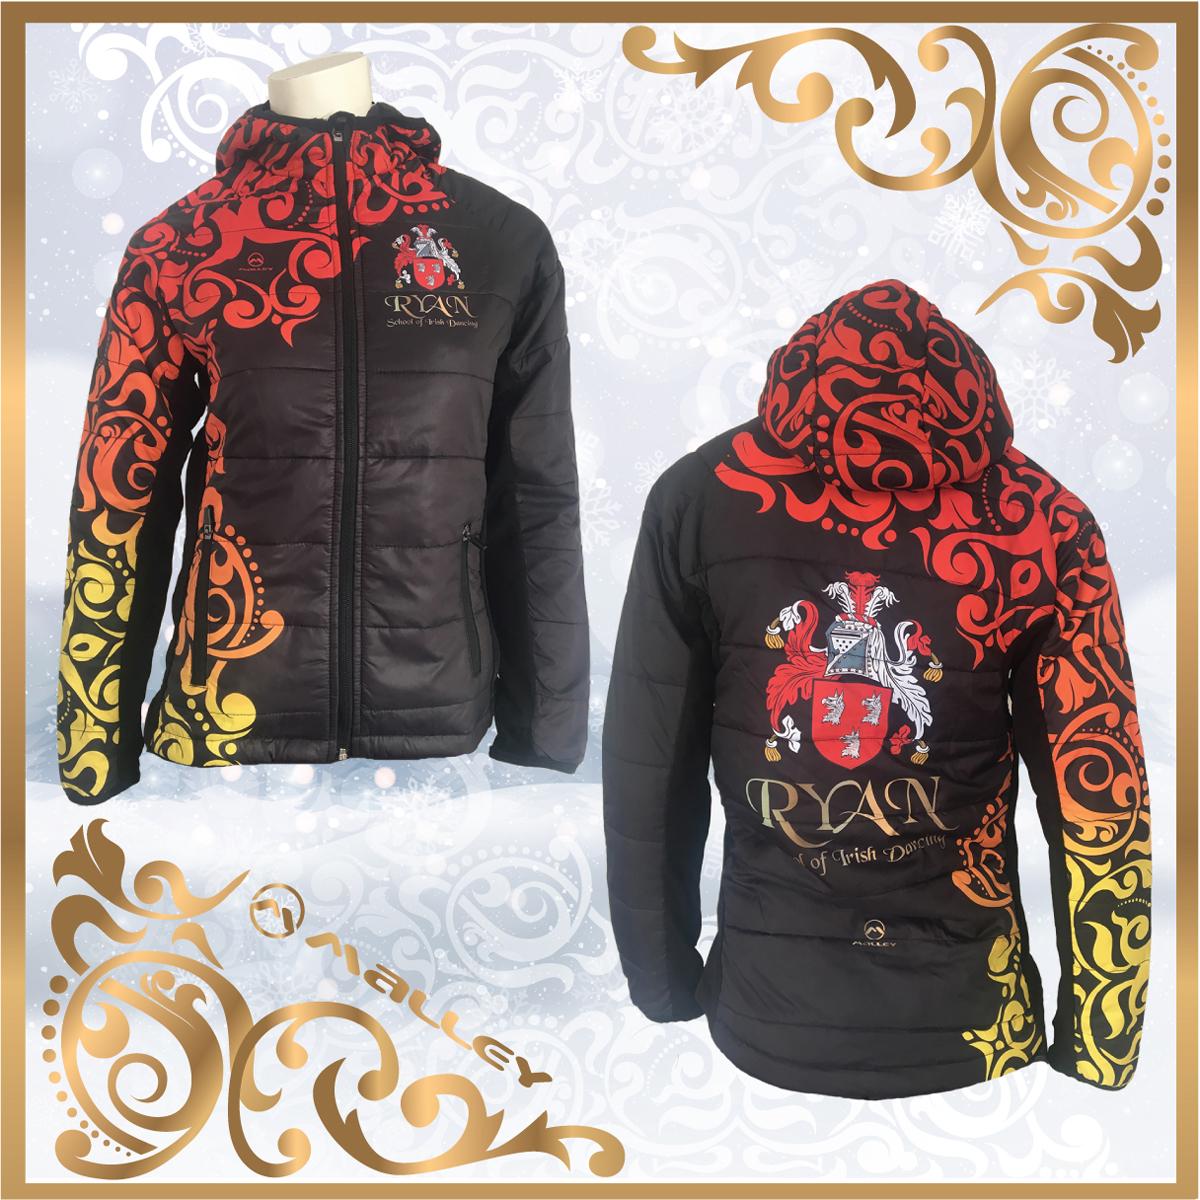 ryan_puffa_jacket.jpg